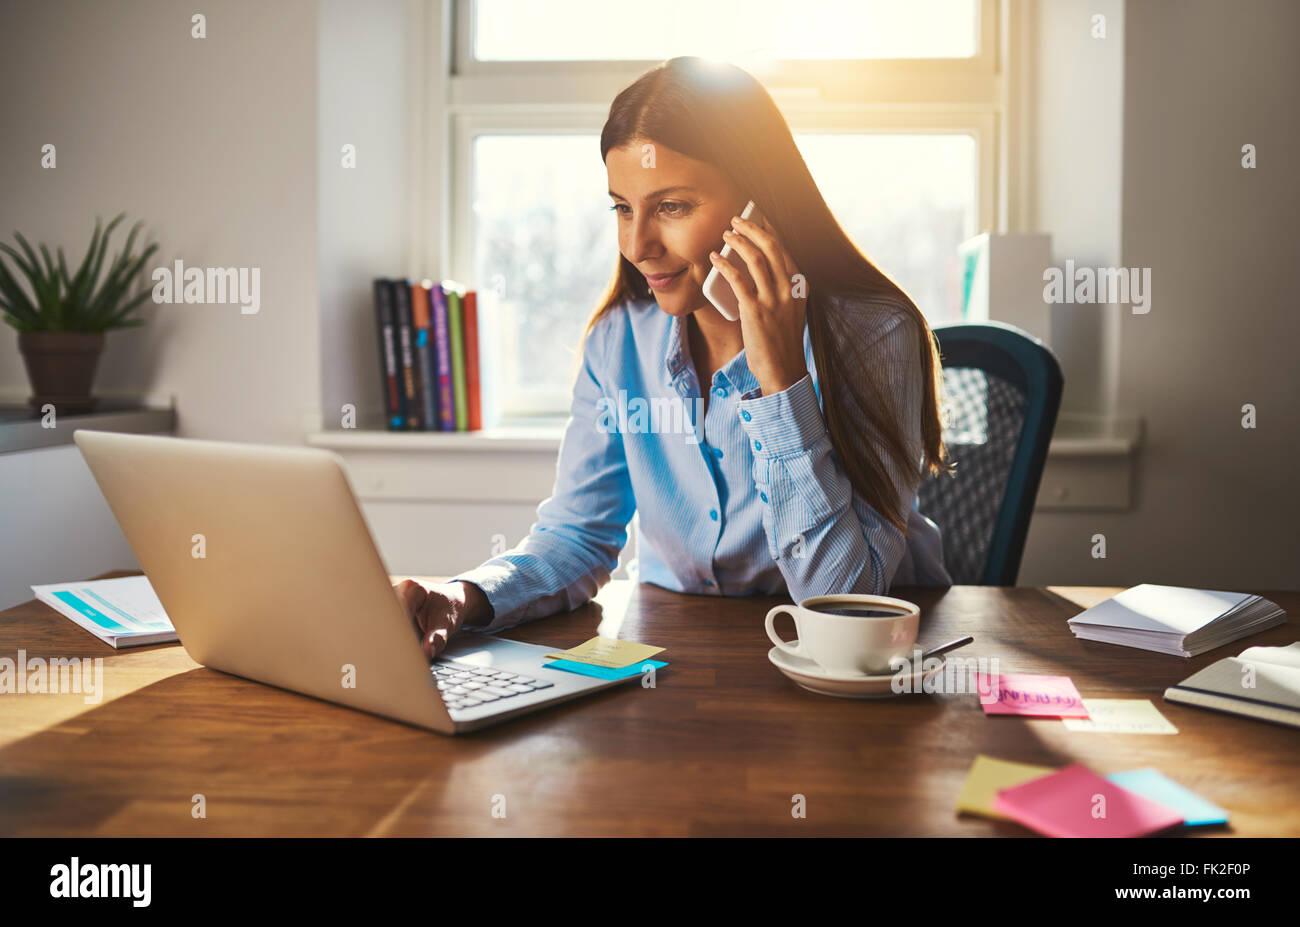 Frau arbeitet am Laptop im Büro während des Gesprächs am Telefon, warmes Licht hinterleuchtet Stockbild